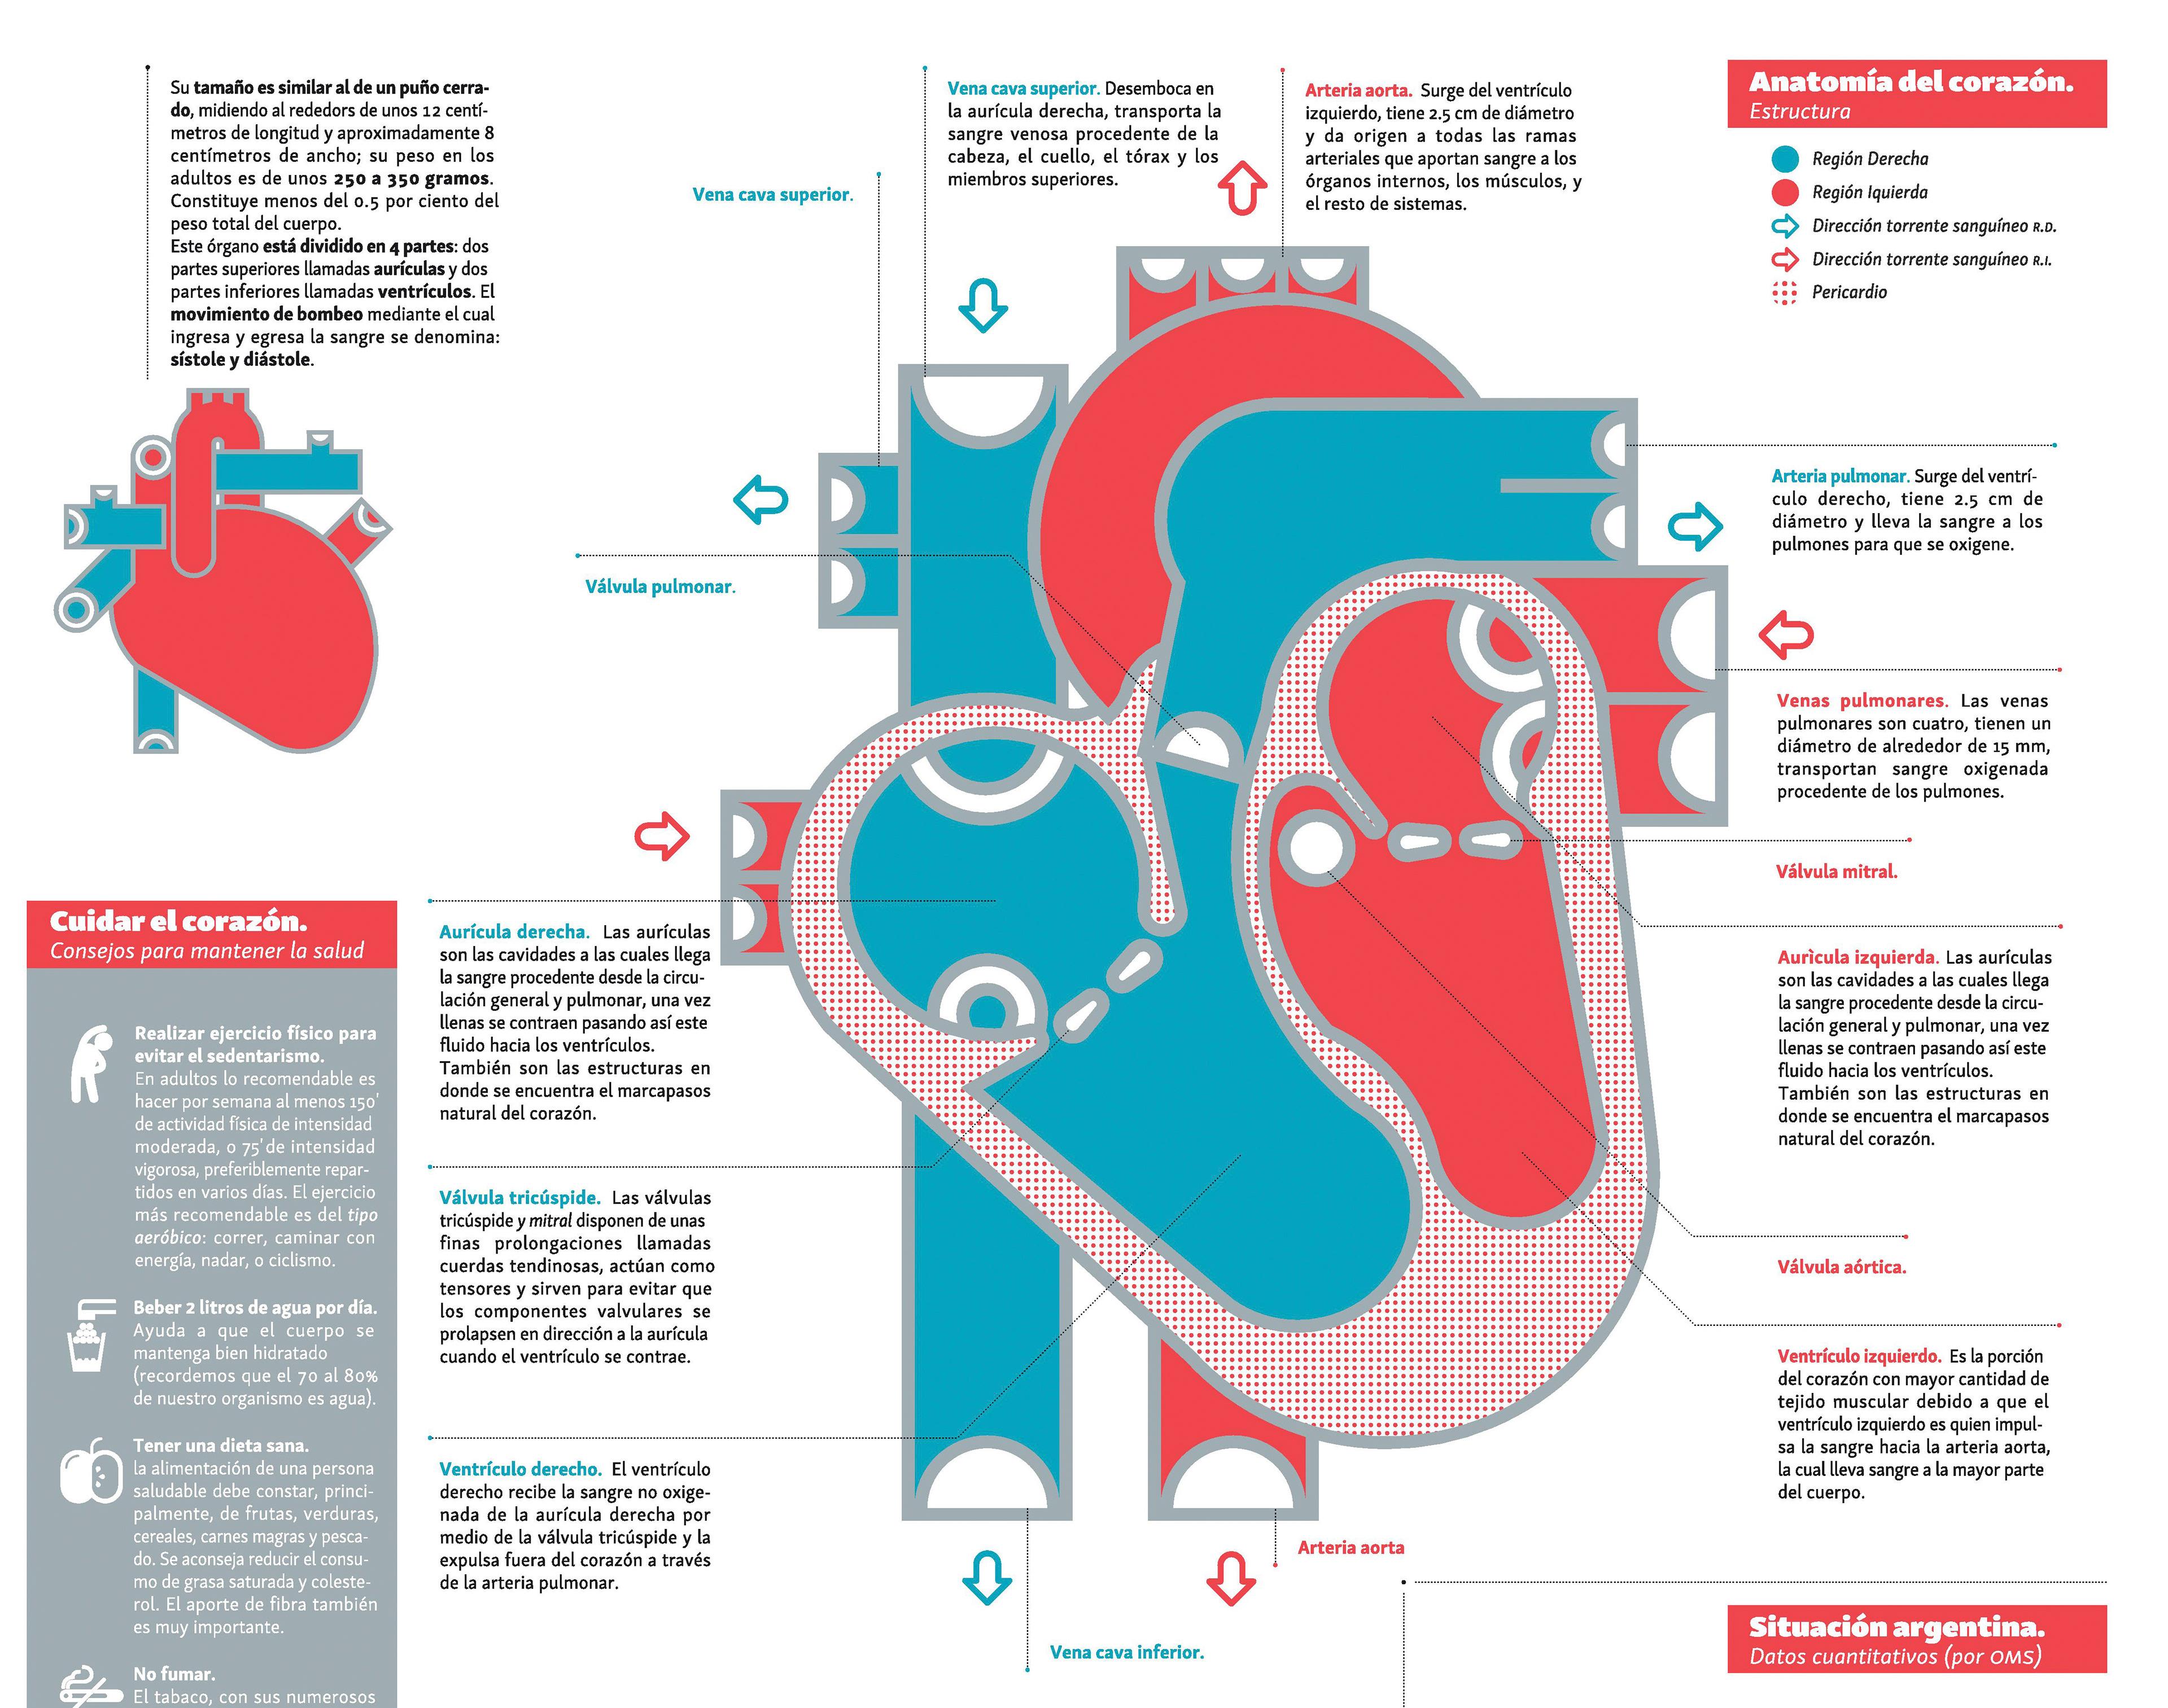 Fiorella Lassalle - Infografía: Corazón y sistema cardiovascular.